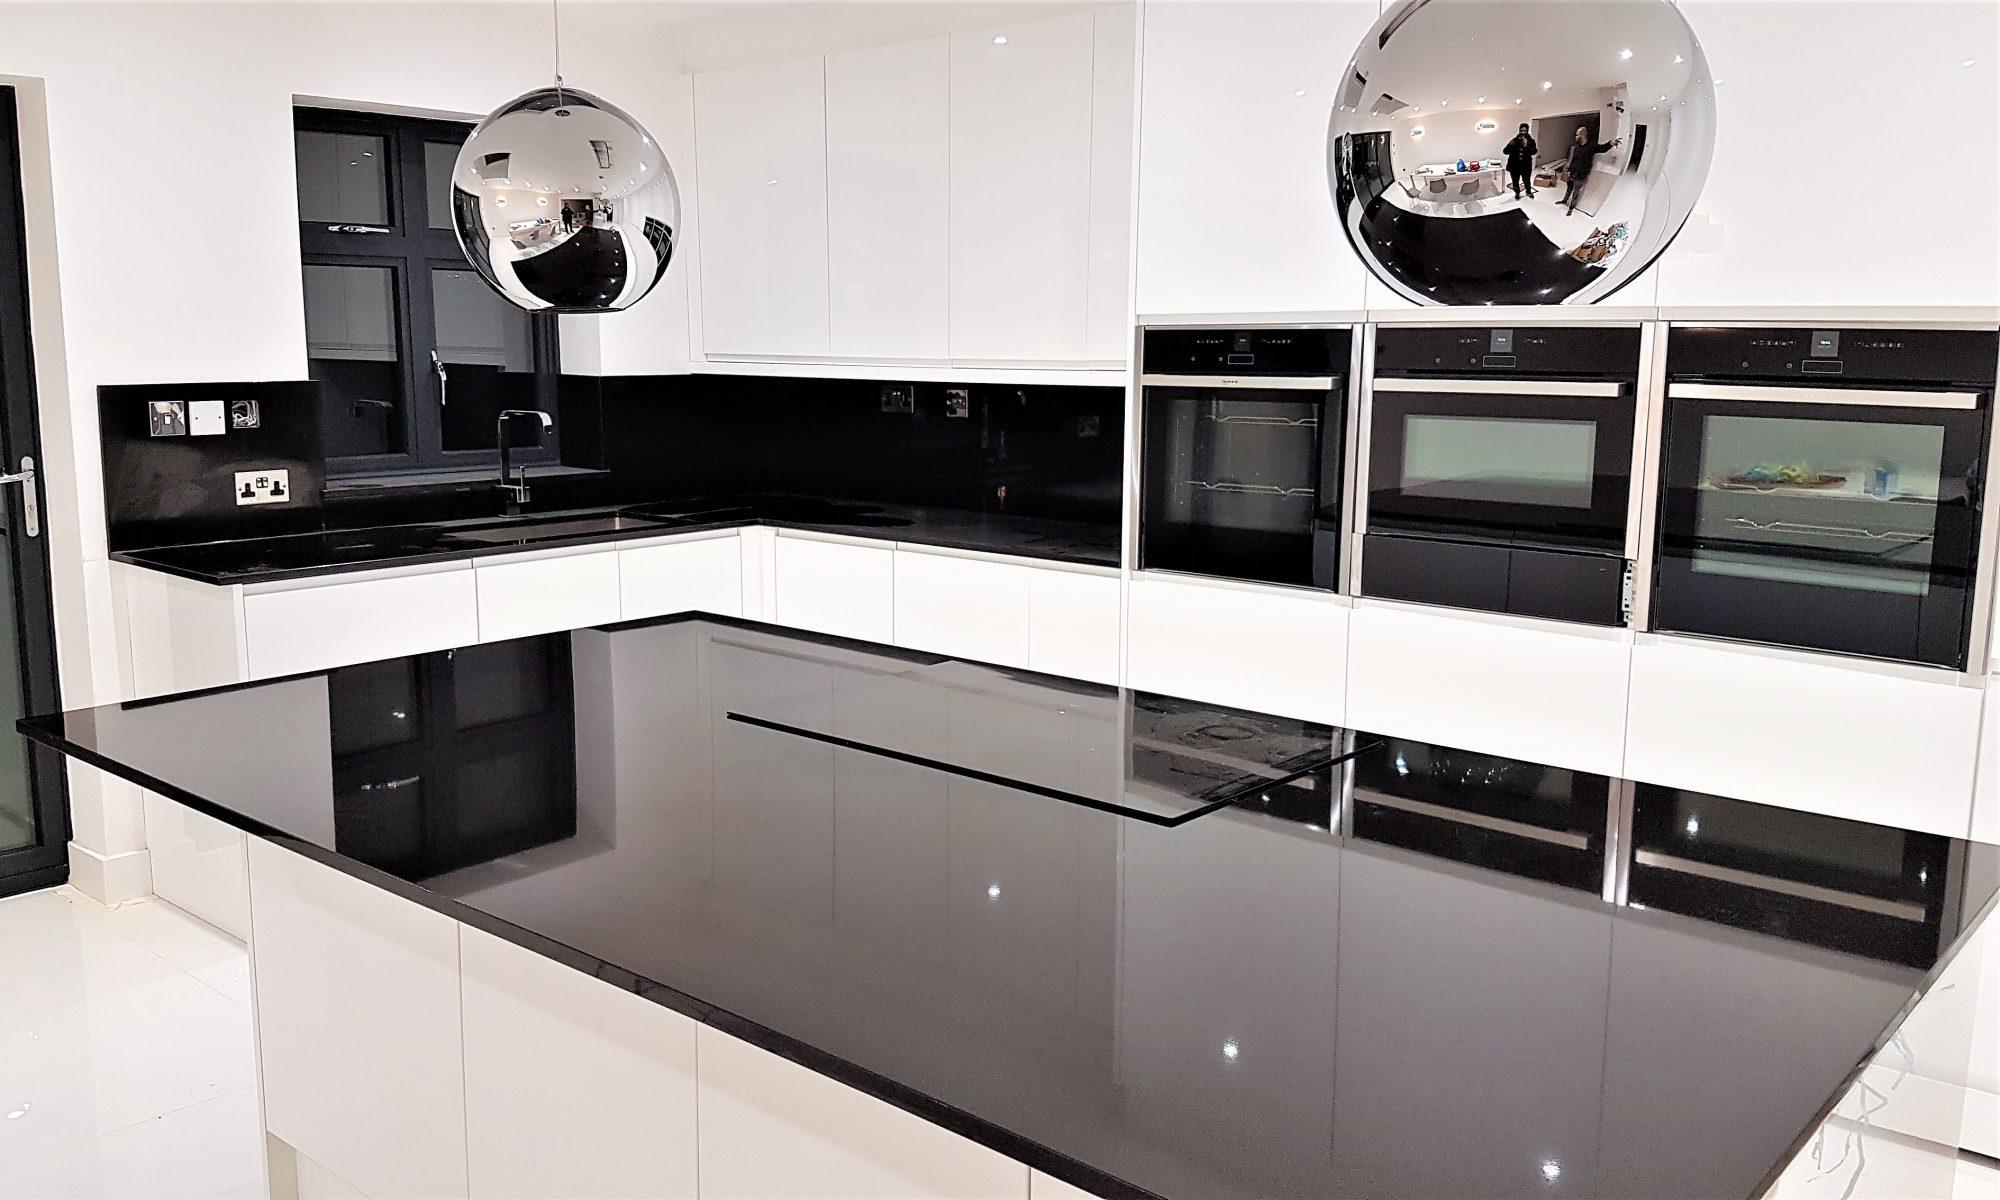 Best Granite Ltd Granite Kitchen Worktops Trade Prices Direct To The Public